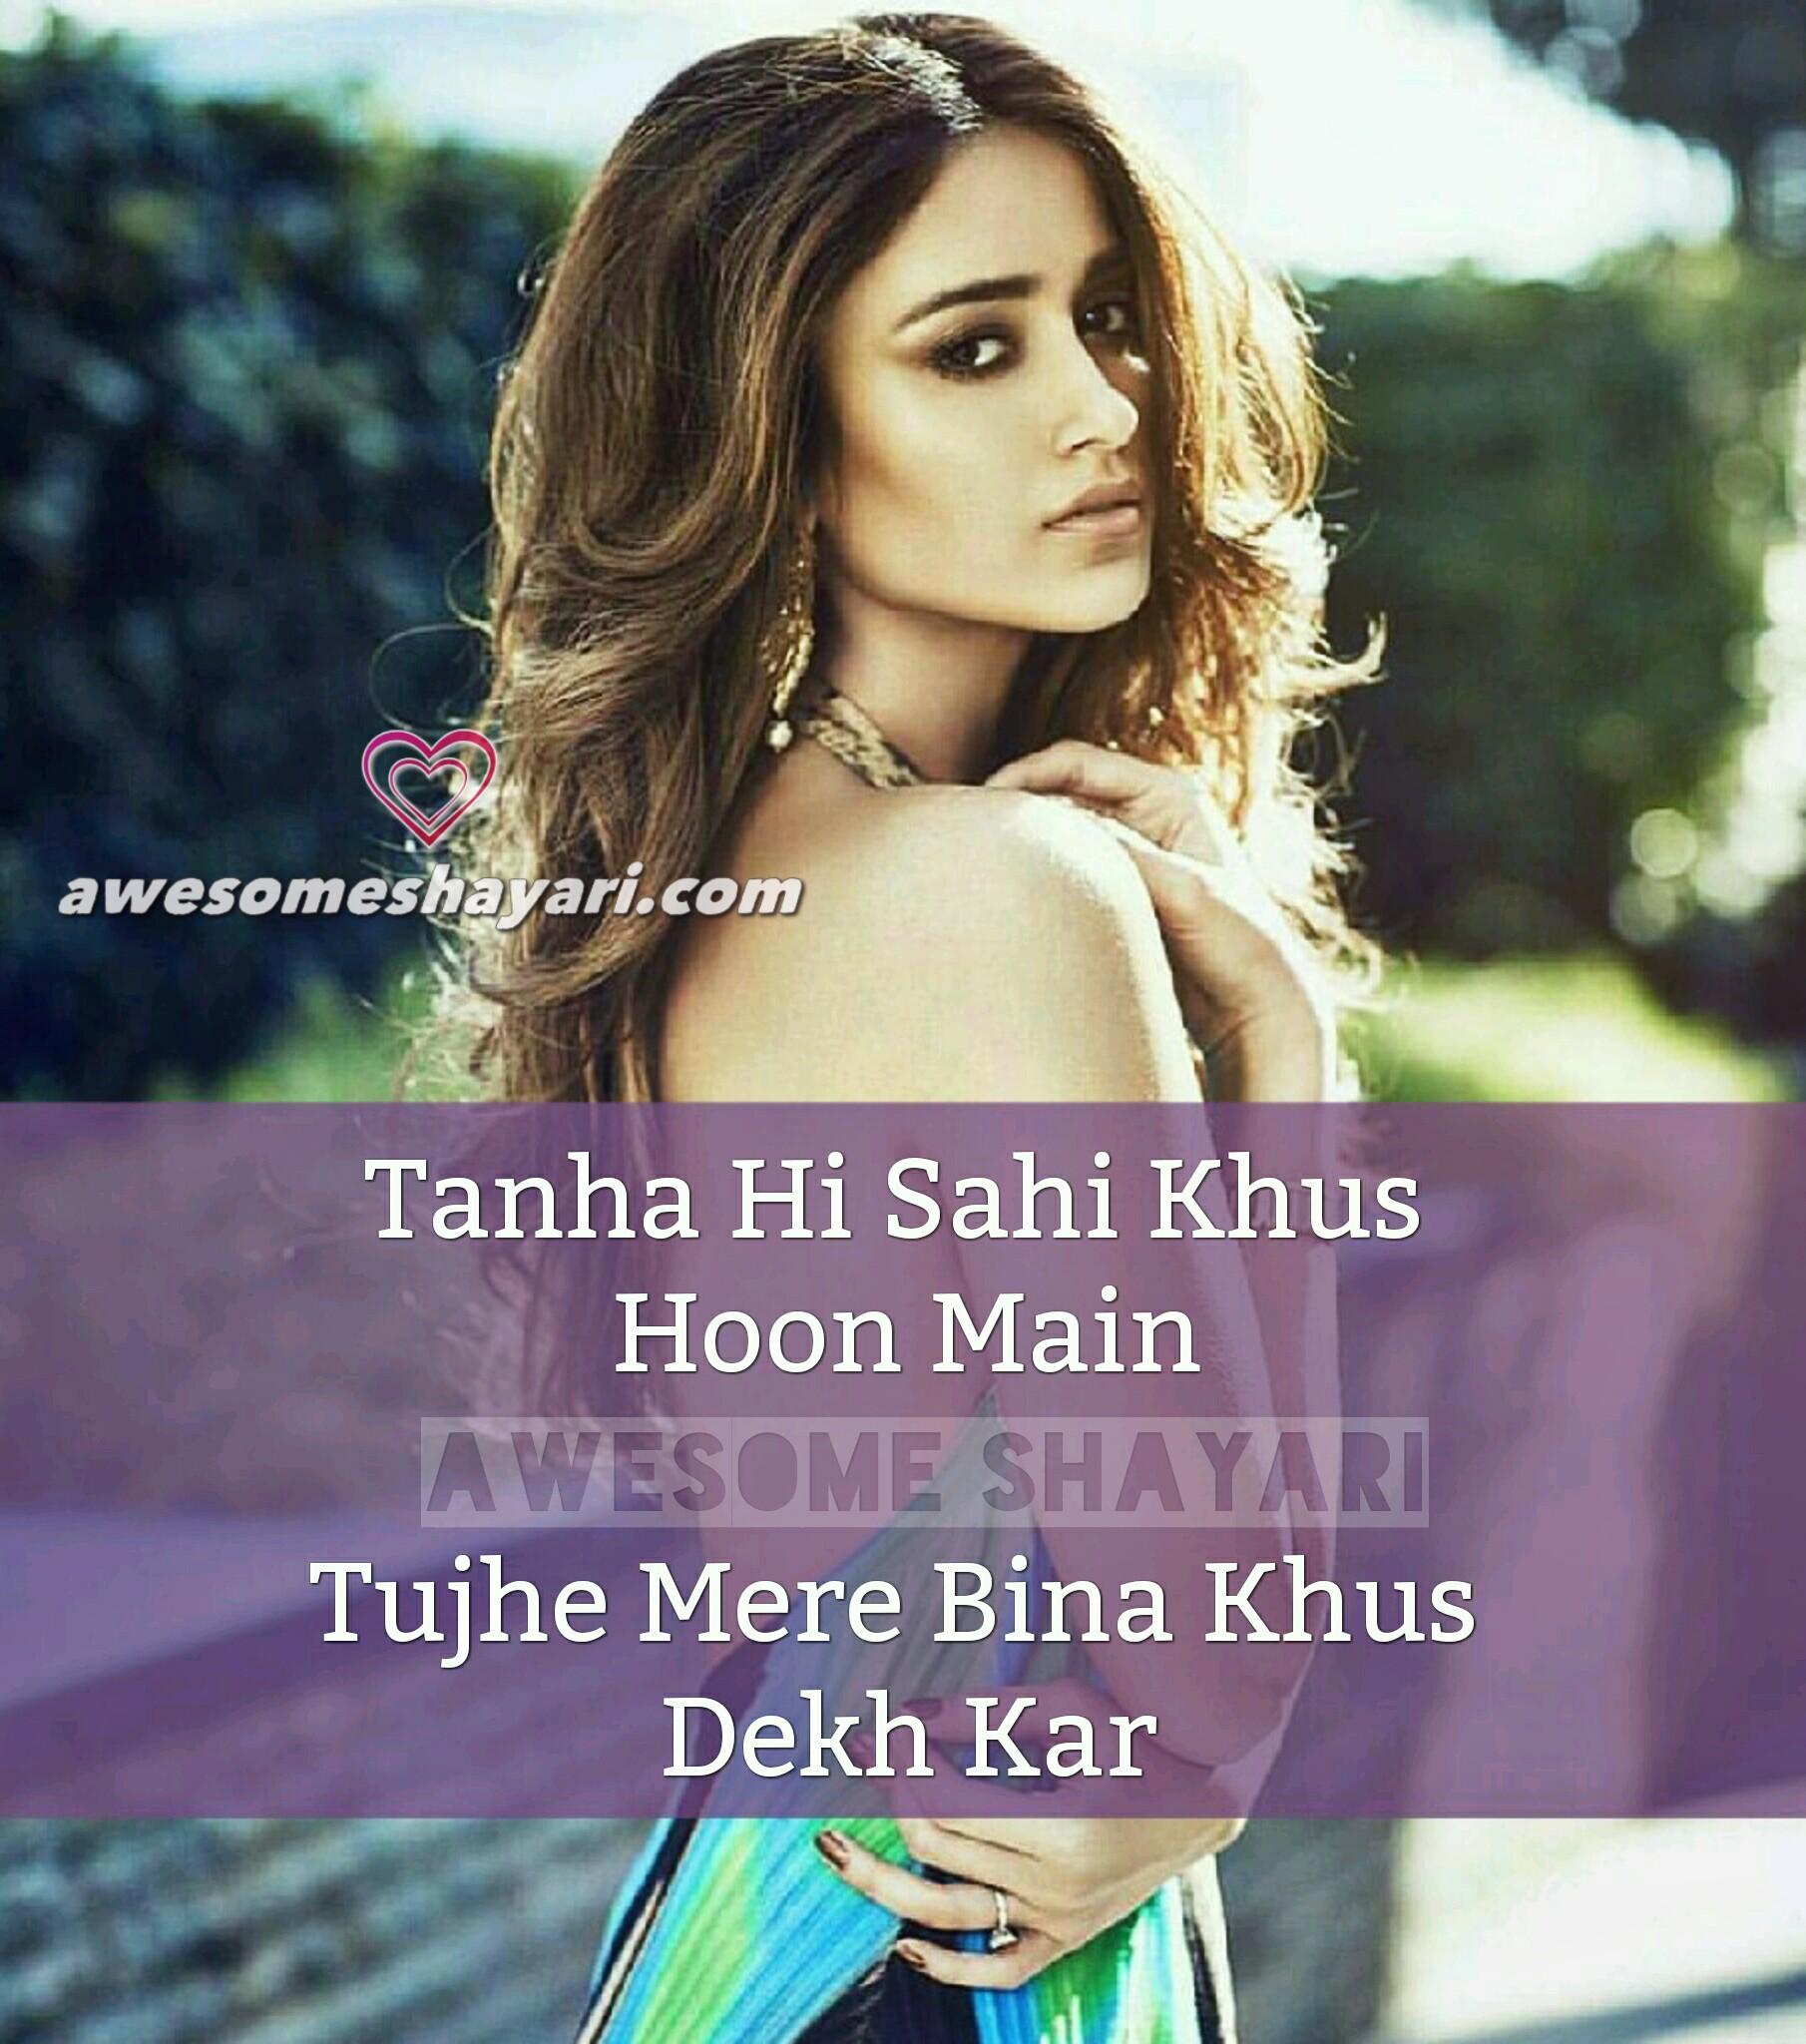 Tanha Shayari